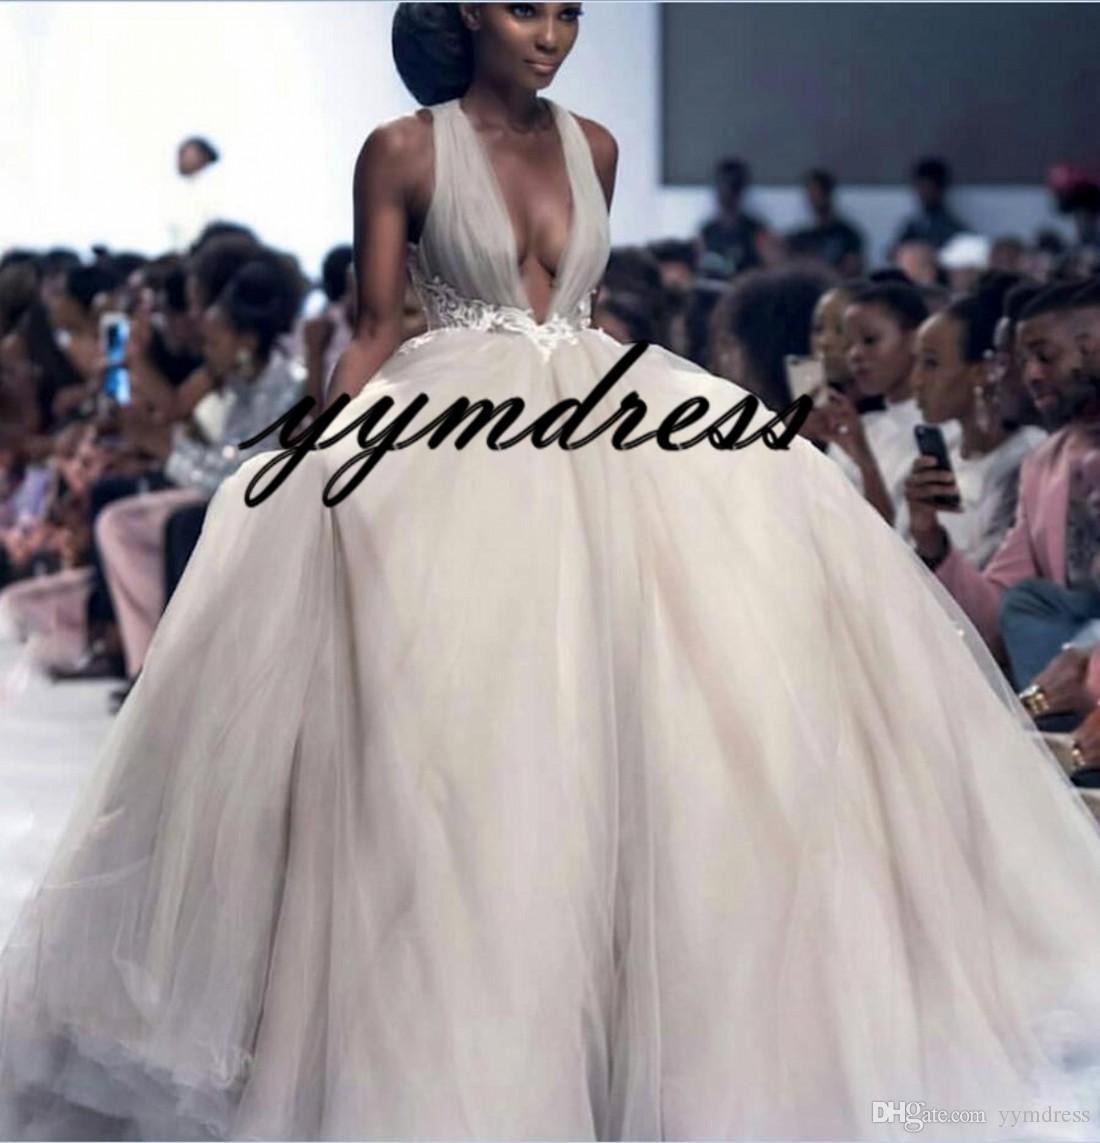 Robes de Mariée 2019 Modeste Jardin A-ligne Détail Superbe église Dubaï arabe nuptiale DressWedding robe col V profond Tulle Backless